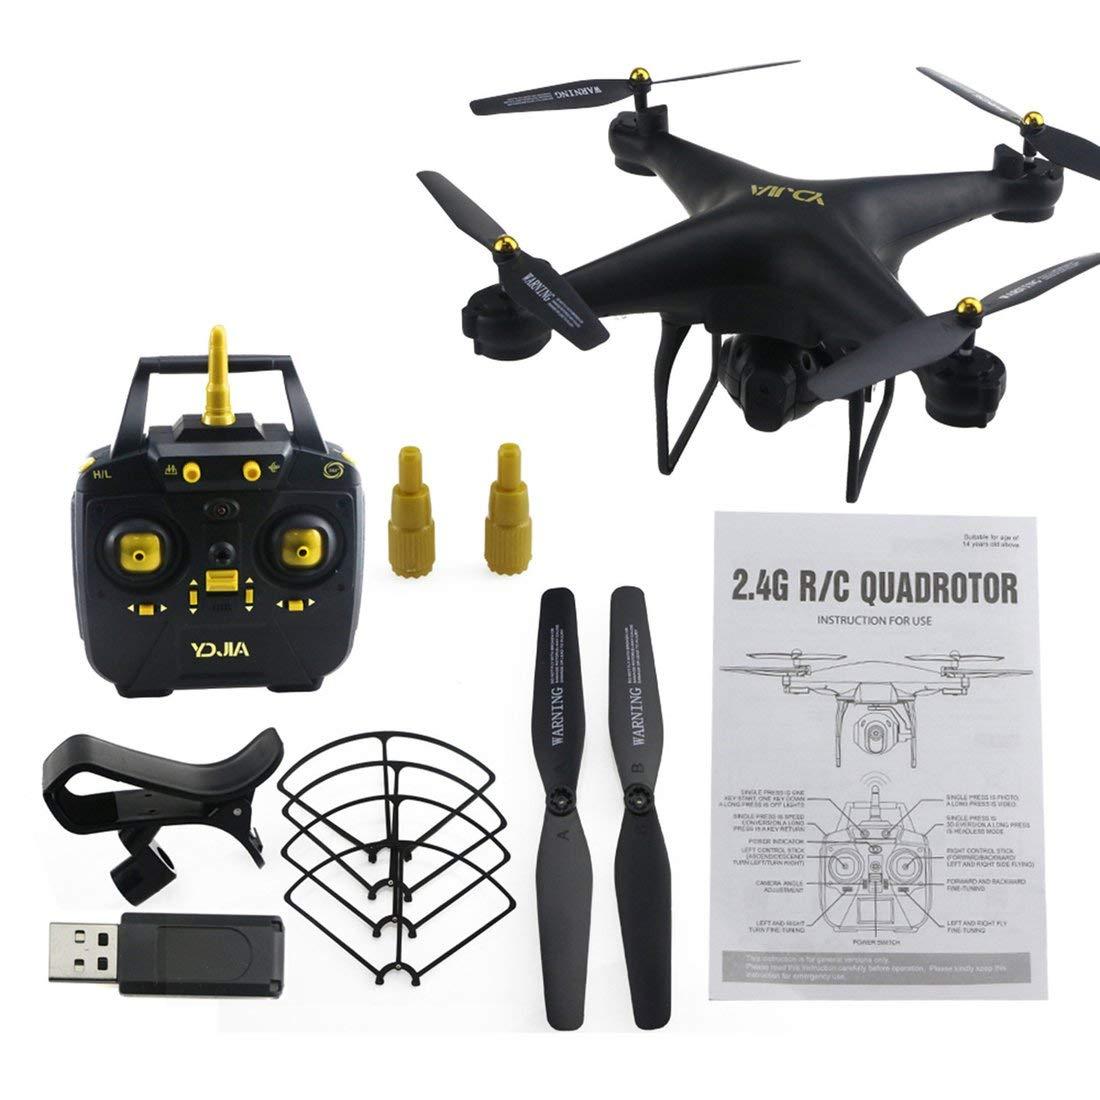 Formulaone D68W-3 2.4G RC Selfie Smart Drohne Quadcopter Flugzeug UAV mit 720 P WiFi FPV Live Video Kamera Höhe Halten 360 ° Flips - Schwarz